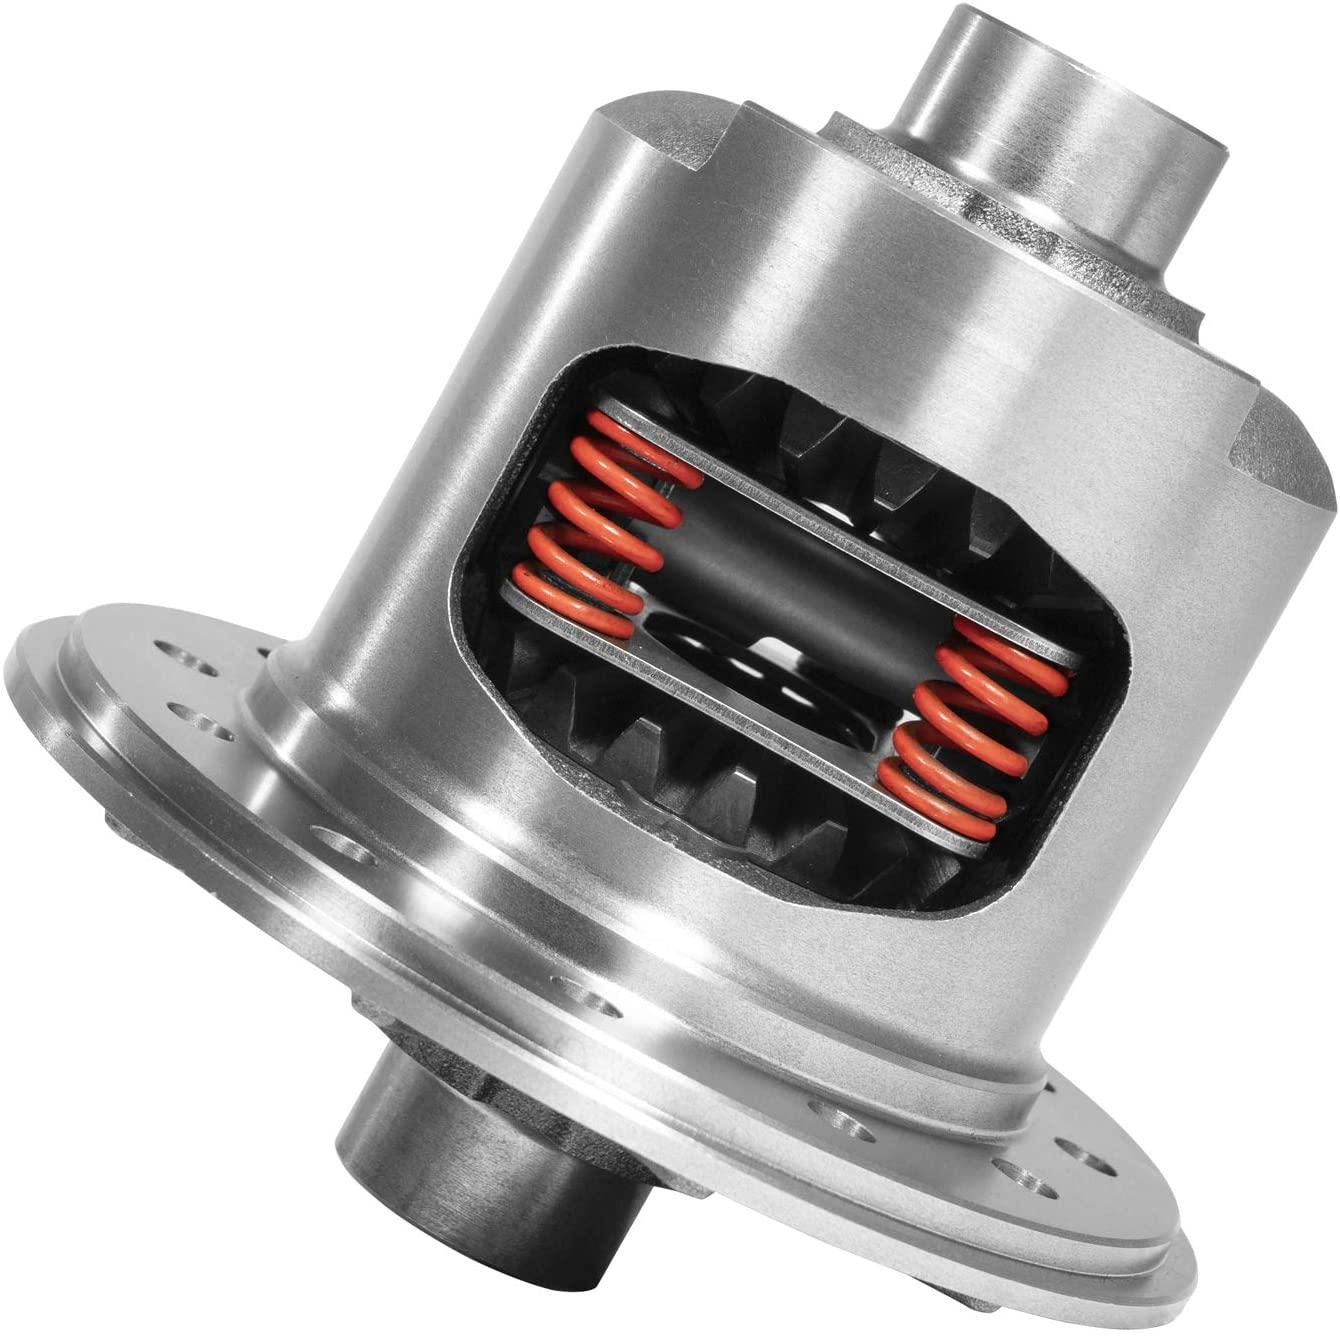 Yukon Gear & Axle (YDGC9.25-31-1) Rear Dura Grip Positraction for Chrysler 9.25 Differential